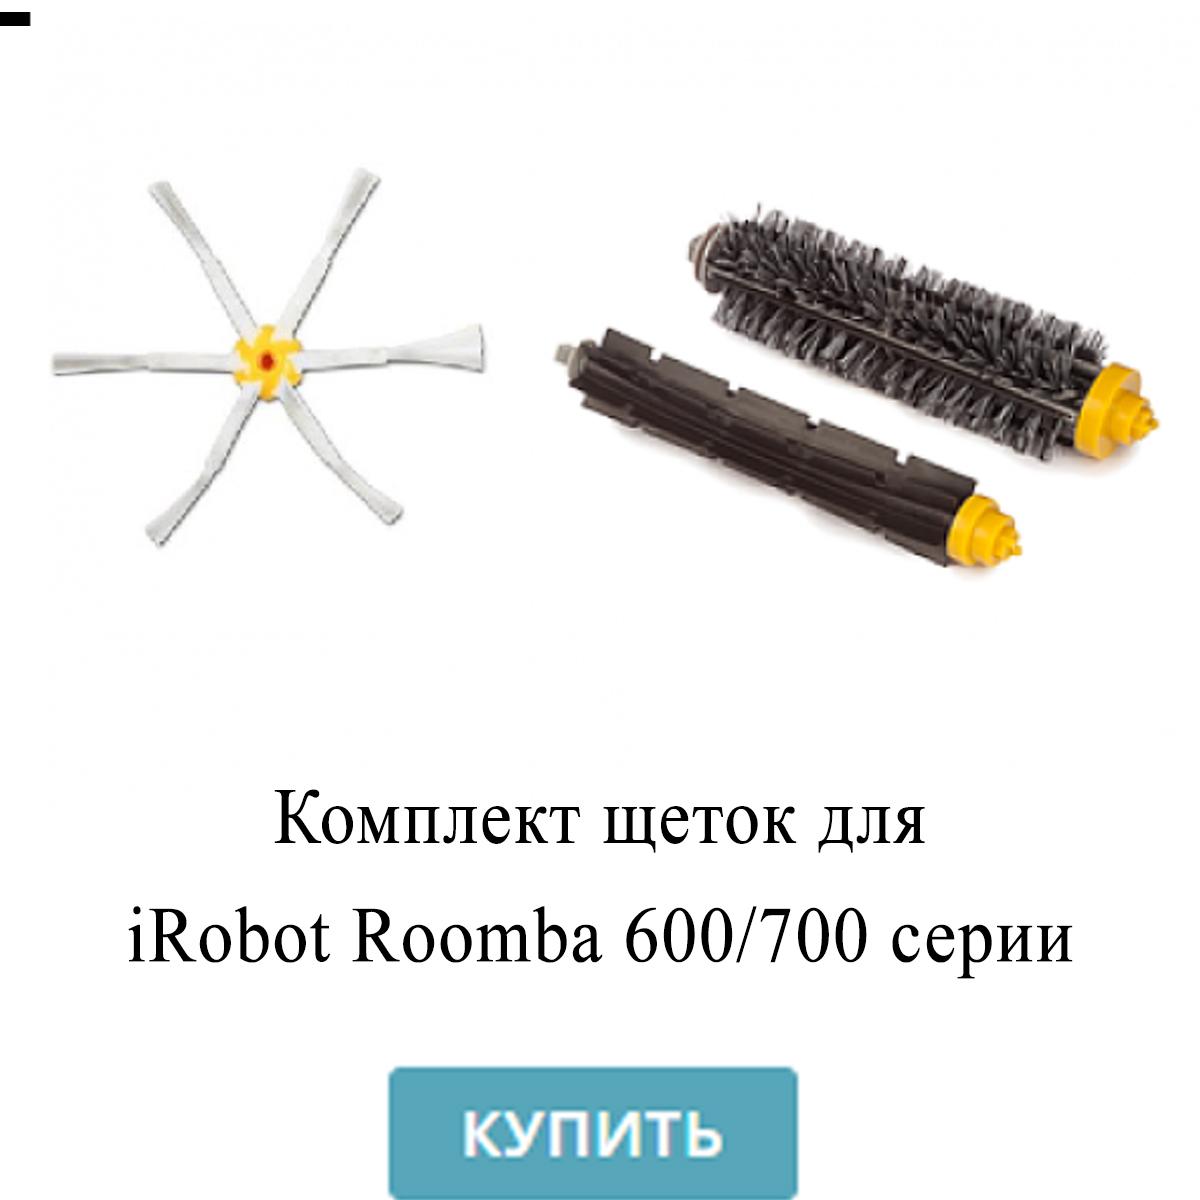 Комплект щеток для iRobot Roomba 600/700 серии